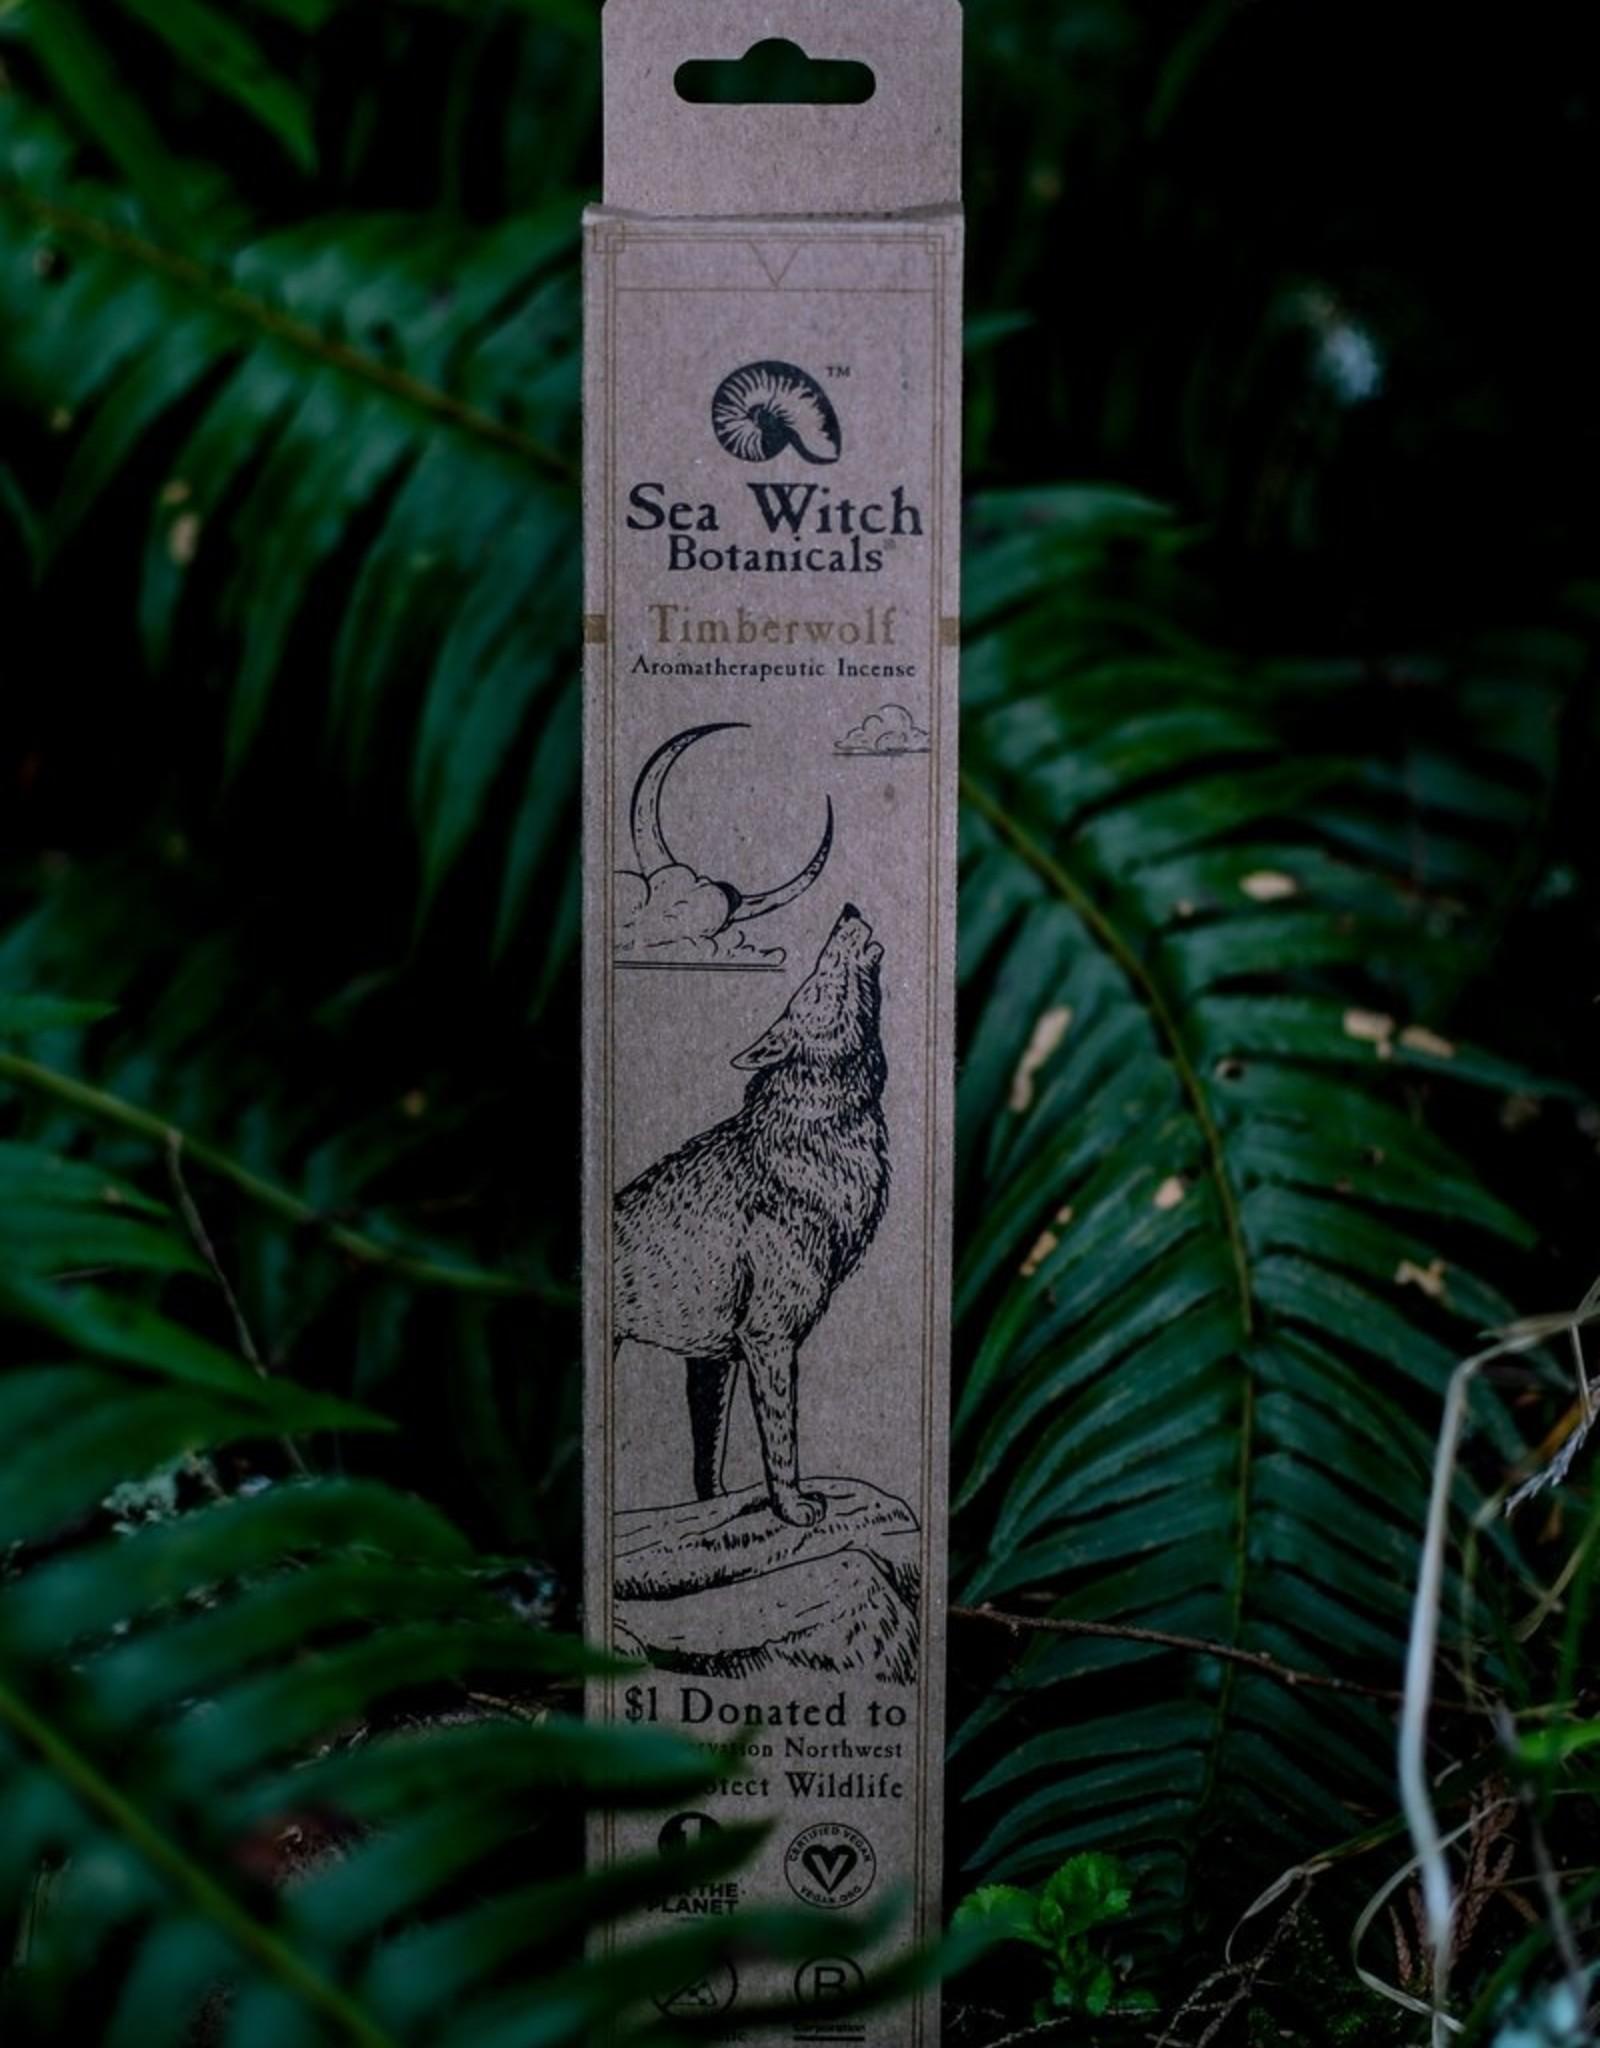 Sea Witch Botanicals Timberwolf Incense